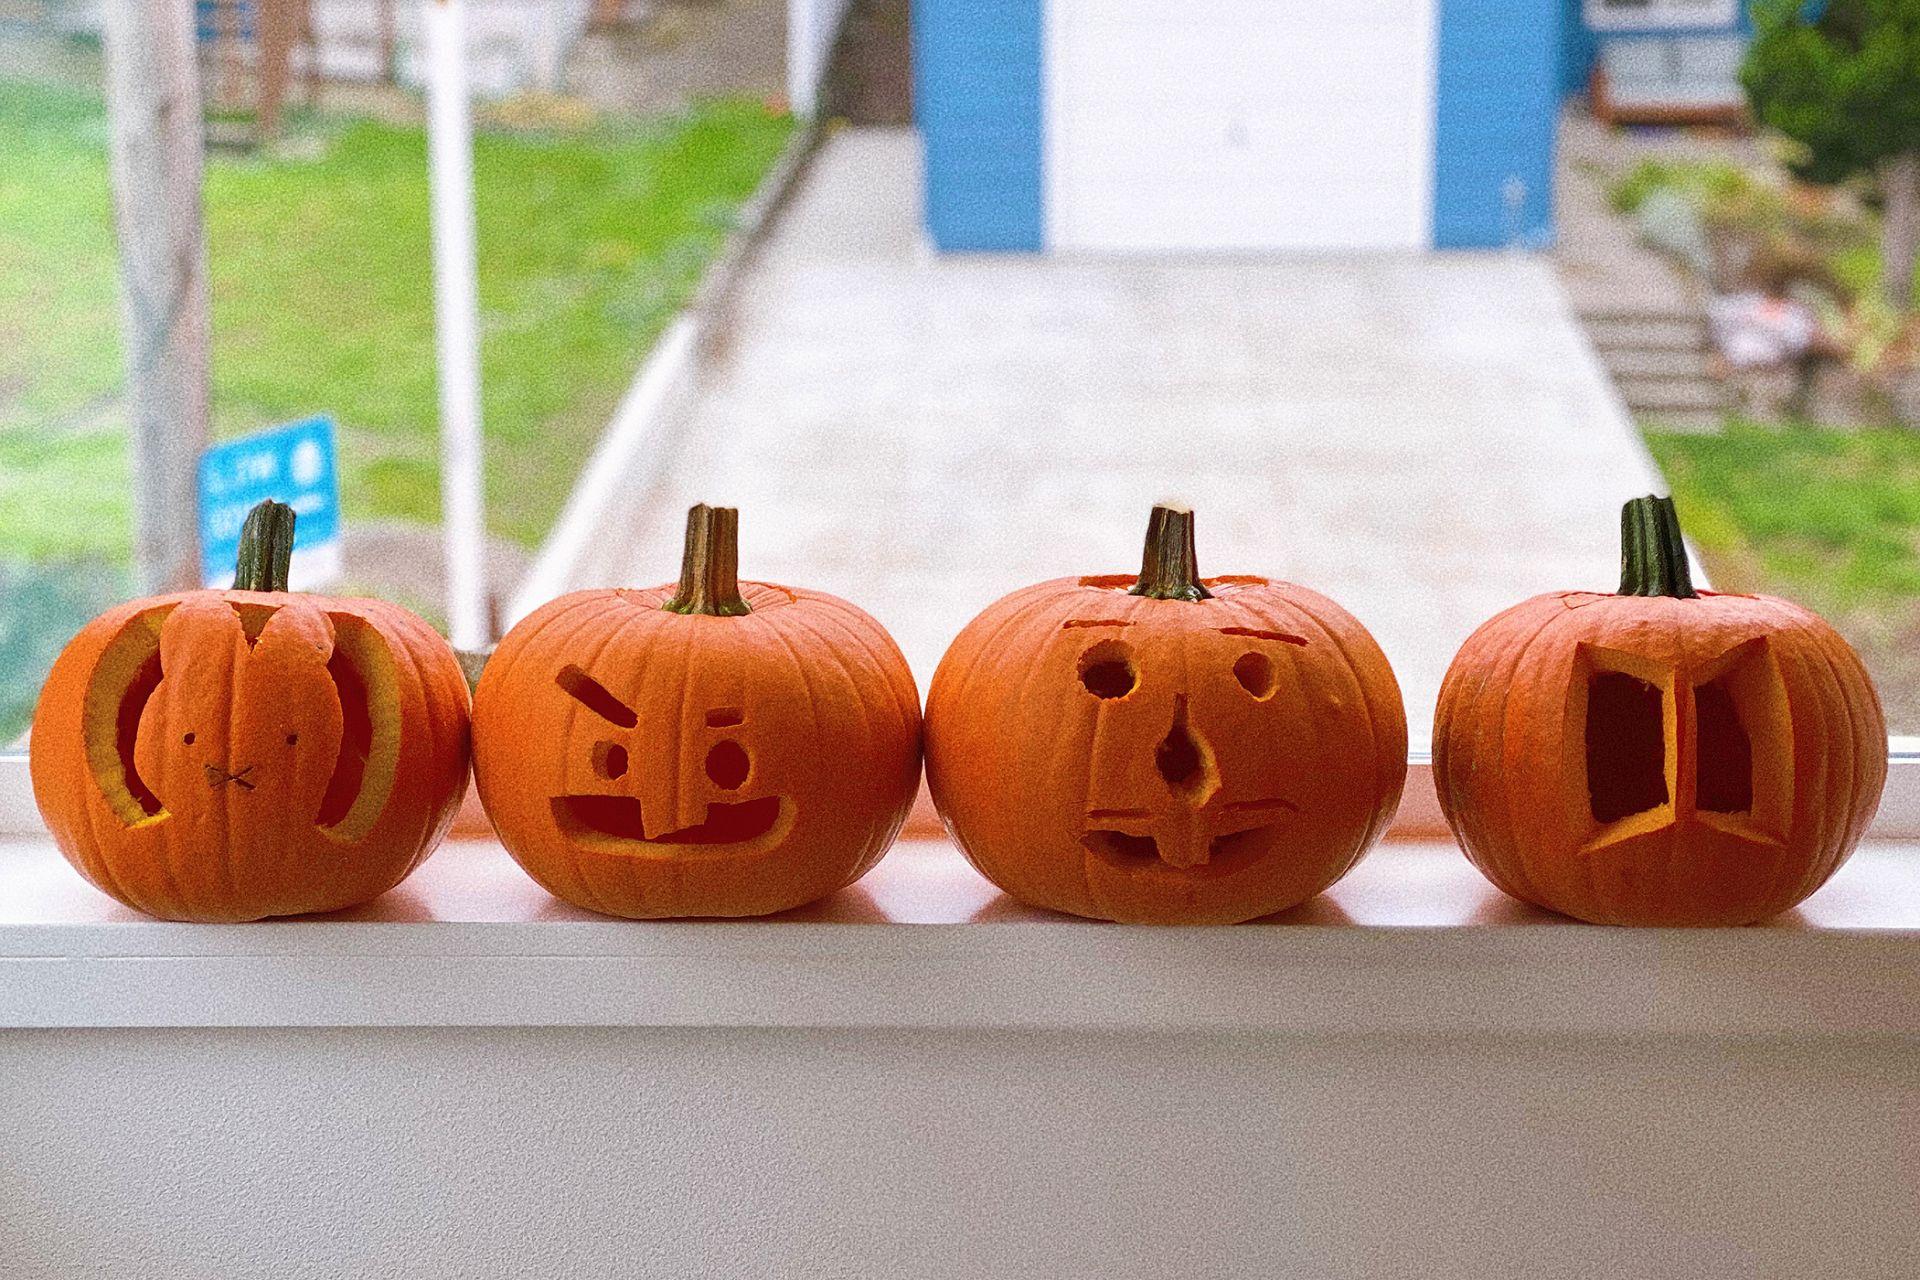 BTS ARMY BT21 Shooky Miffy pumpkin carving